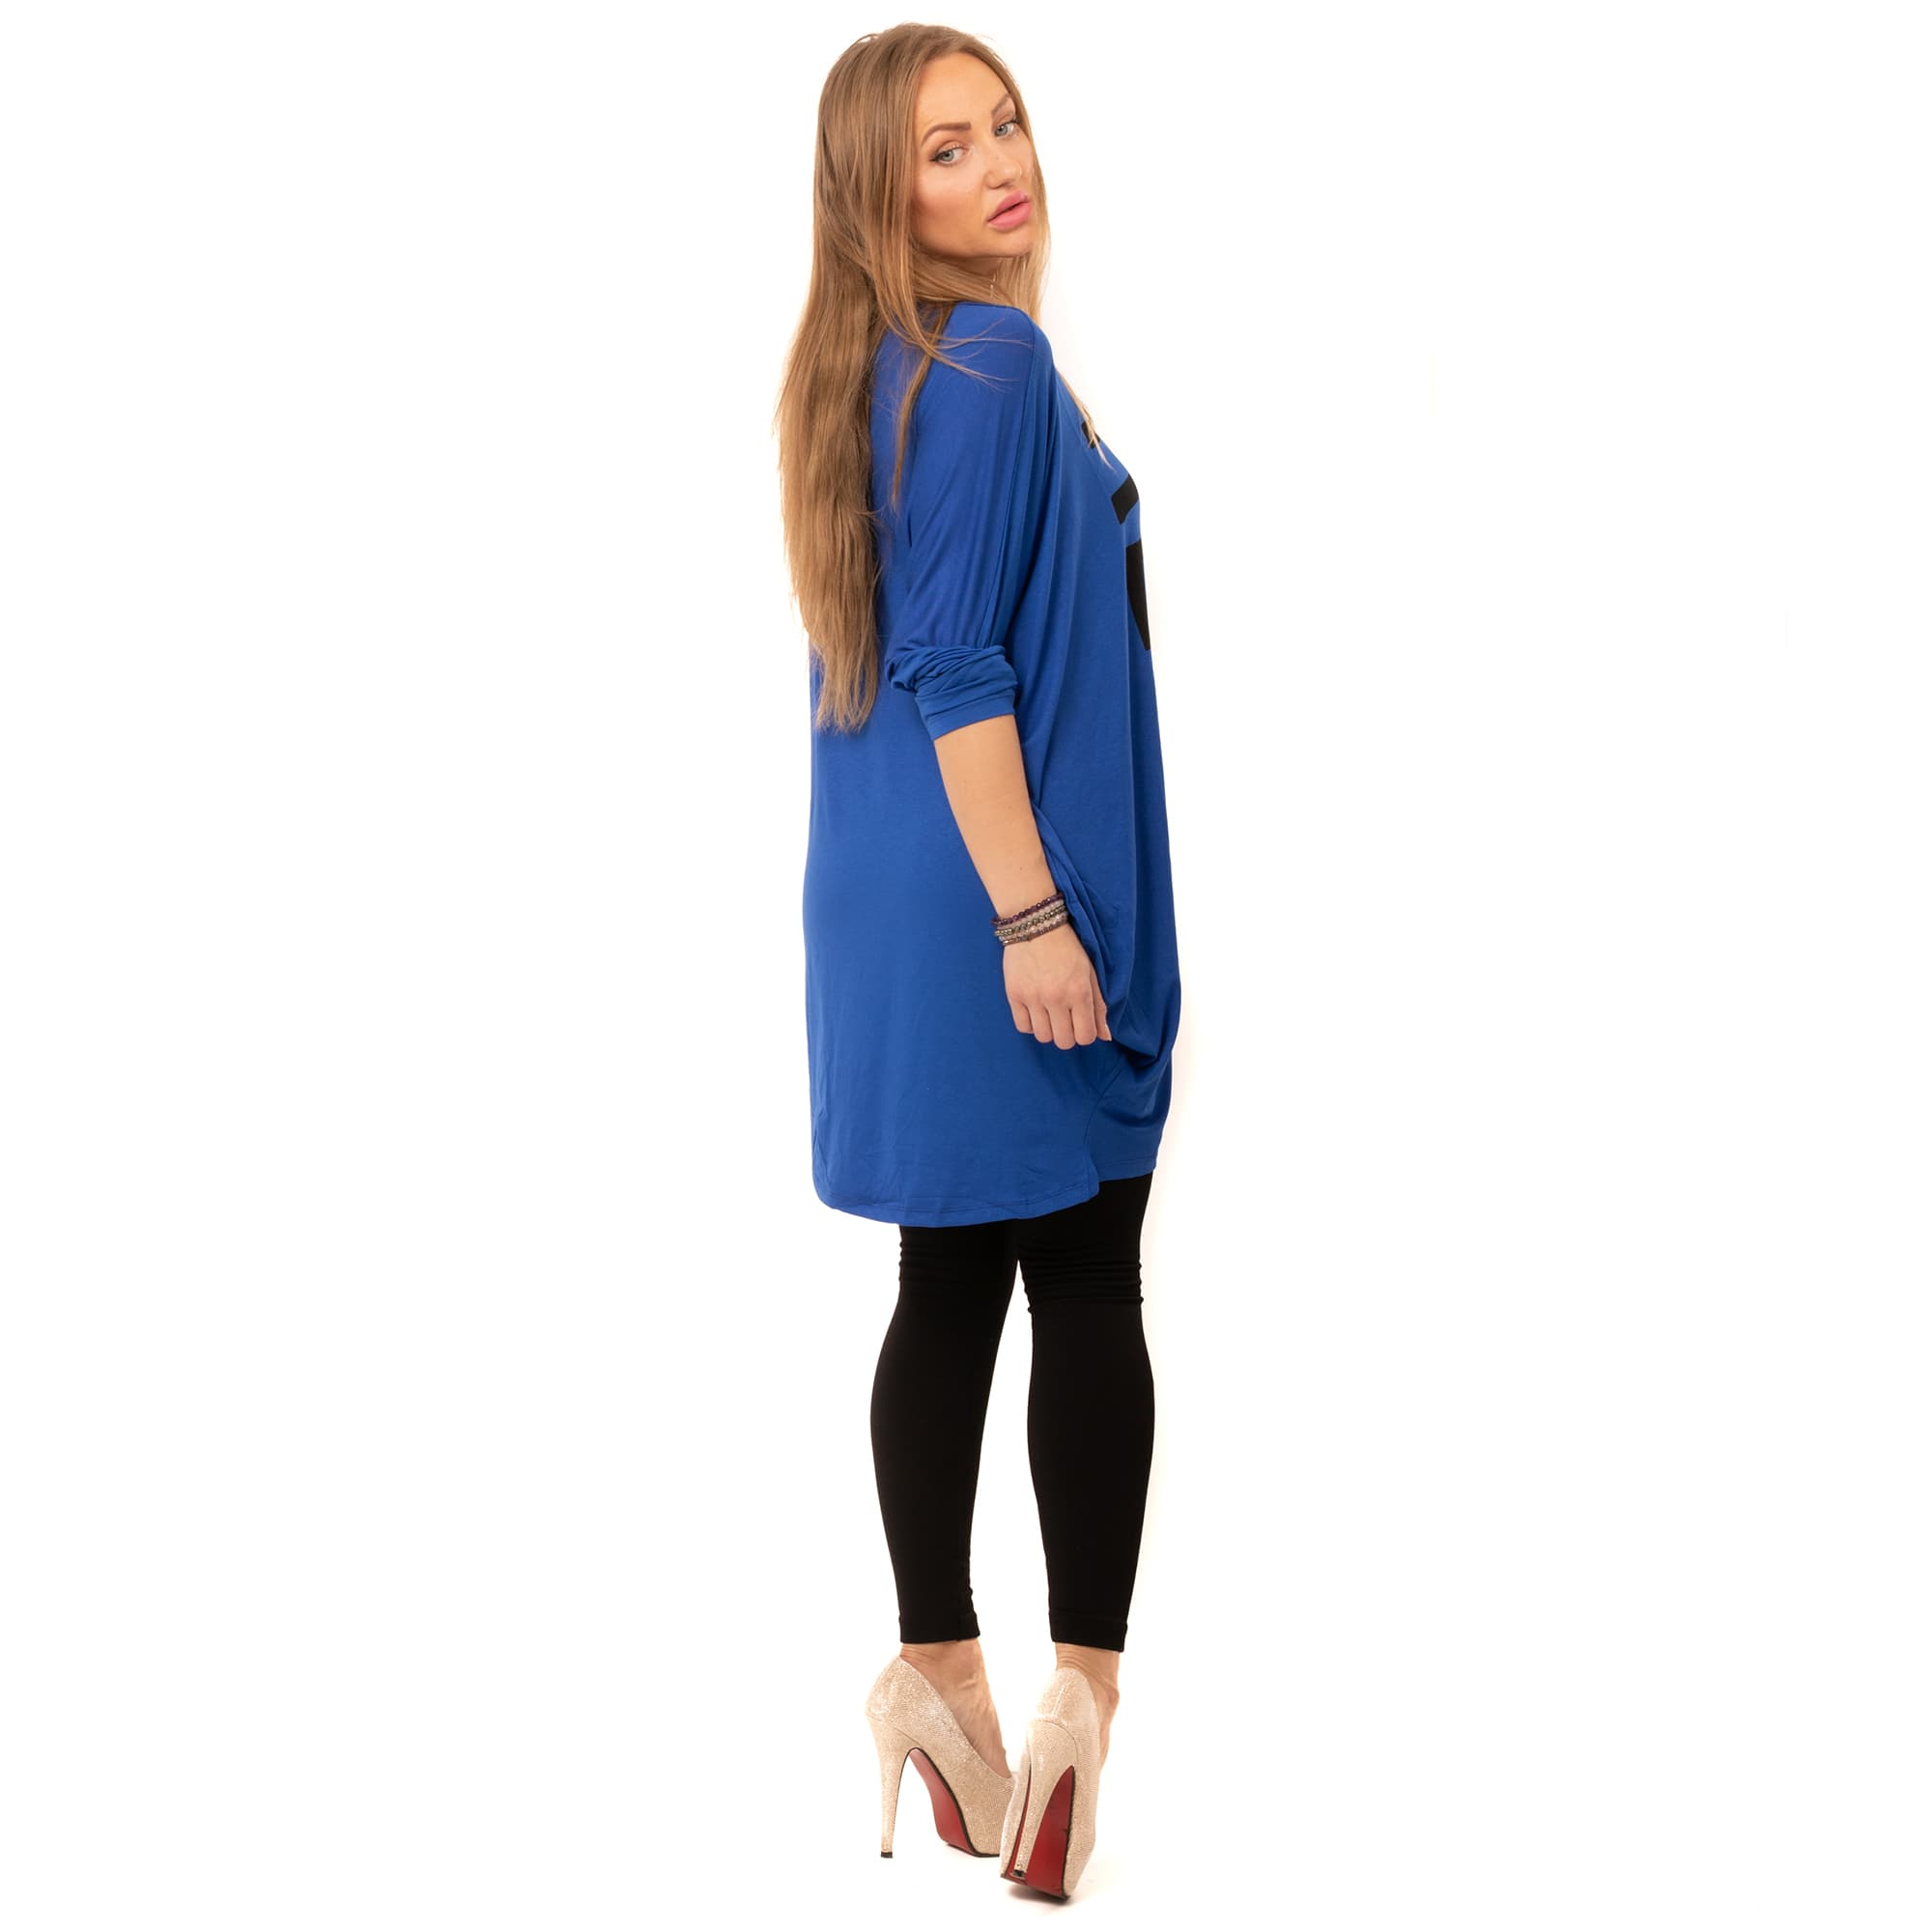 14de36aa3c8 ... Dámská móda a doplňky - Tunika Relax - modrá ...